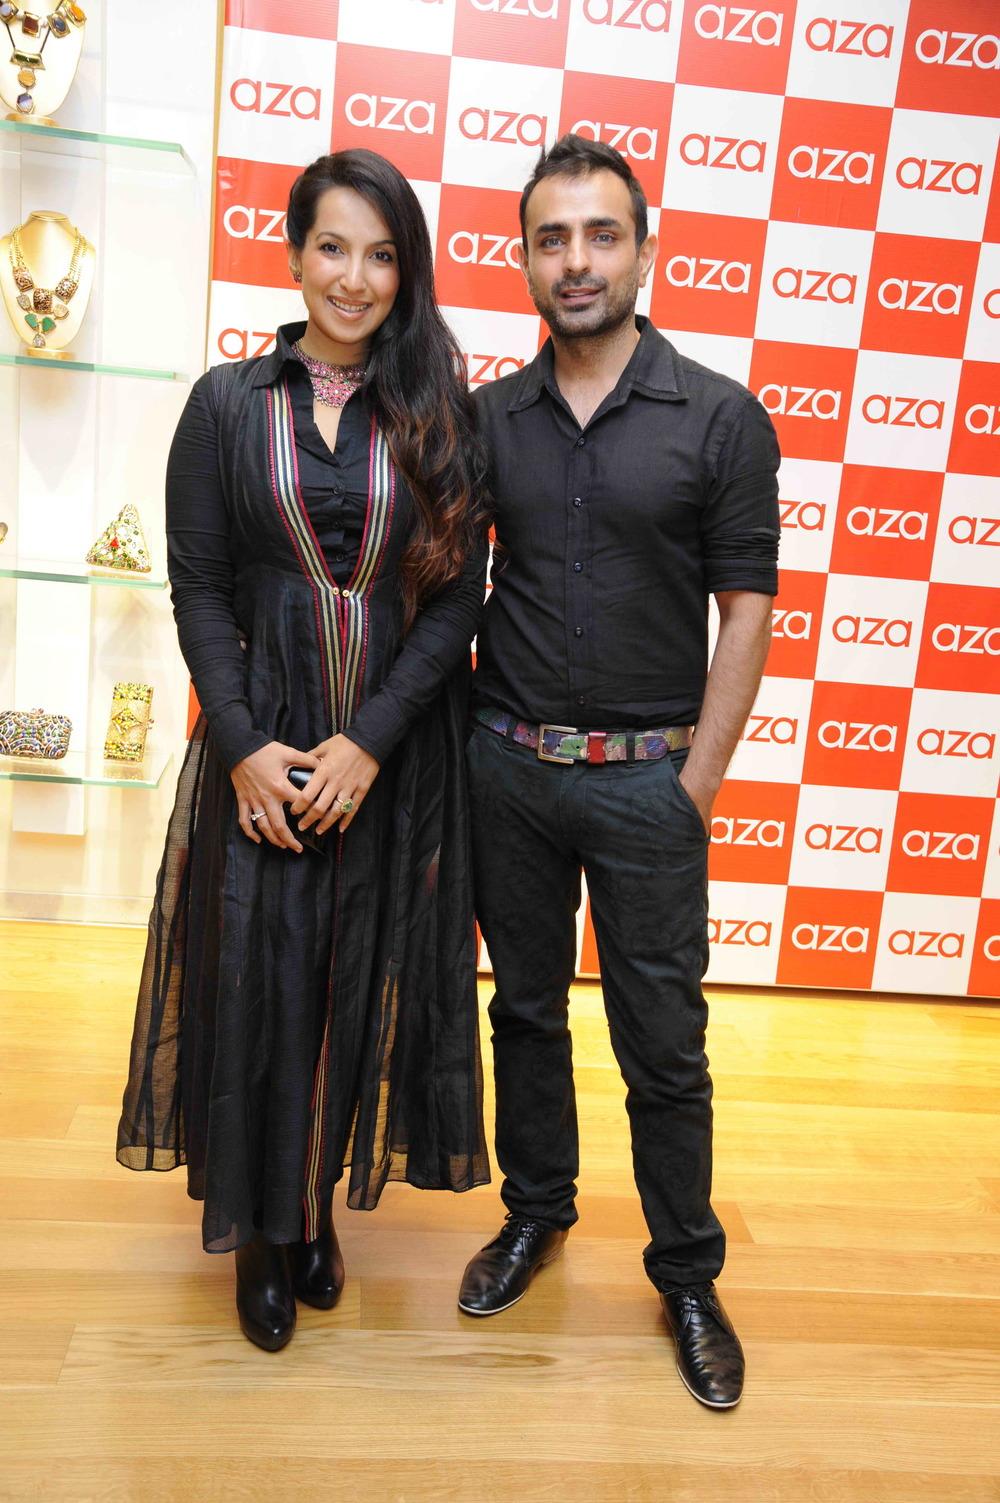 Shradha Nigam & Mayank Anand